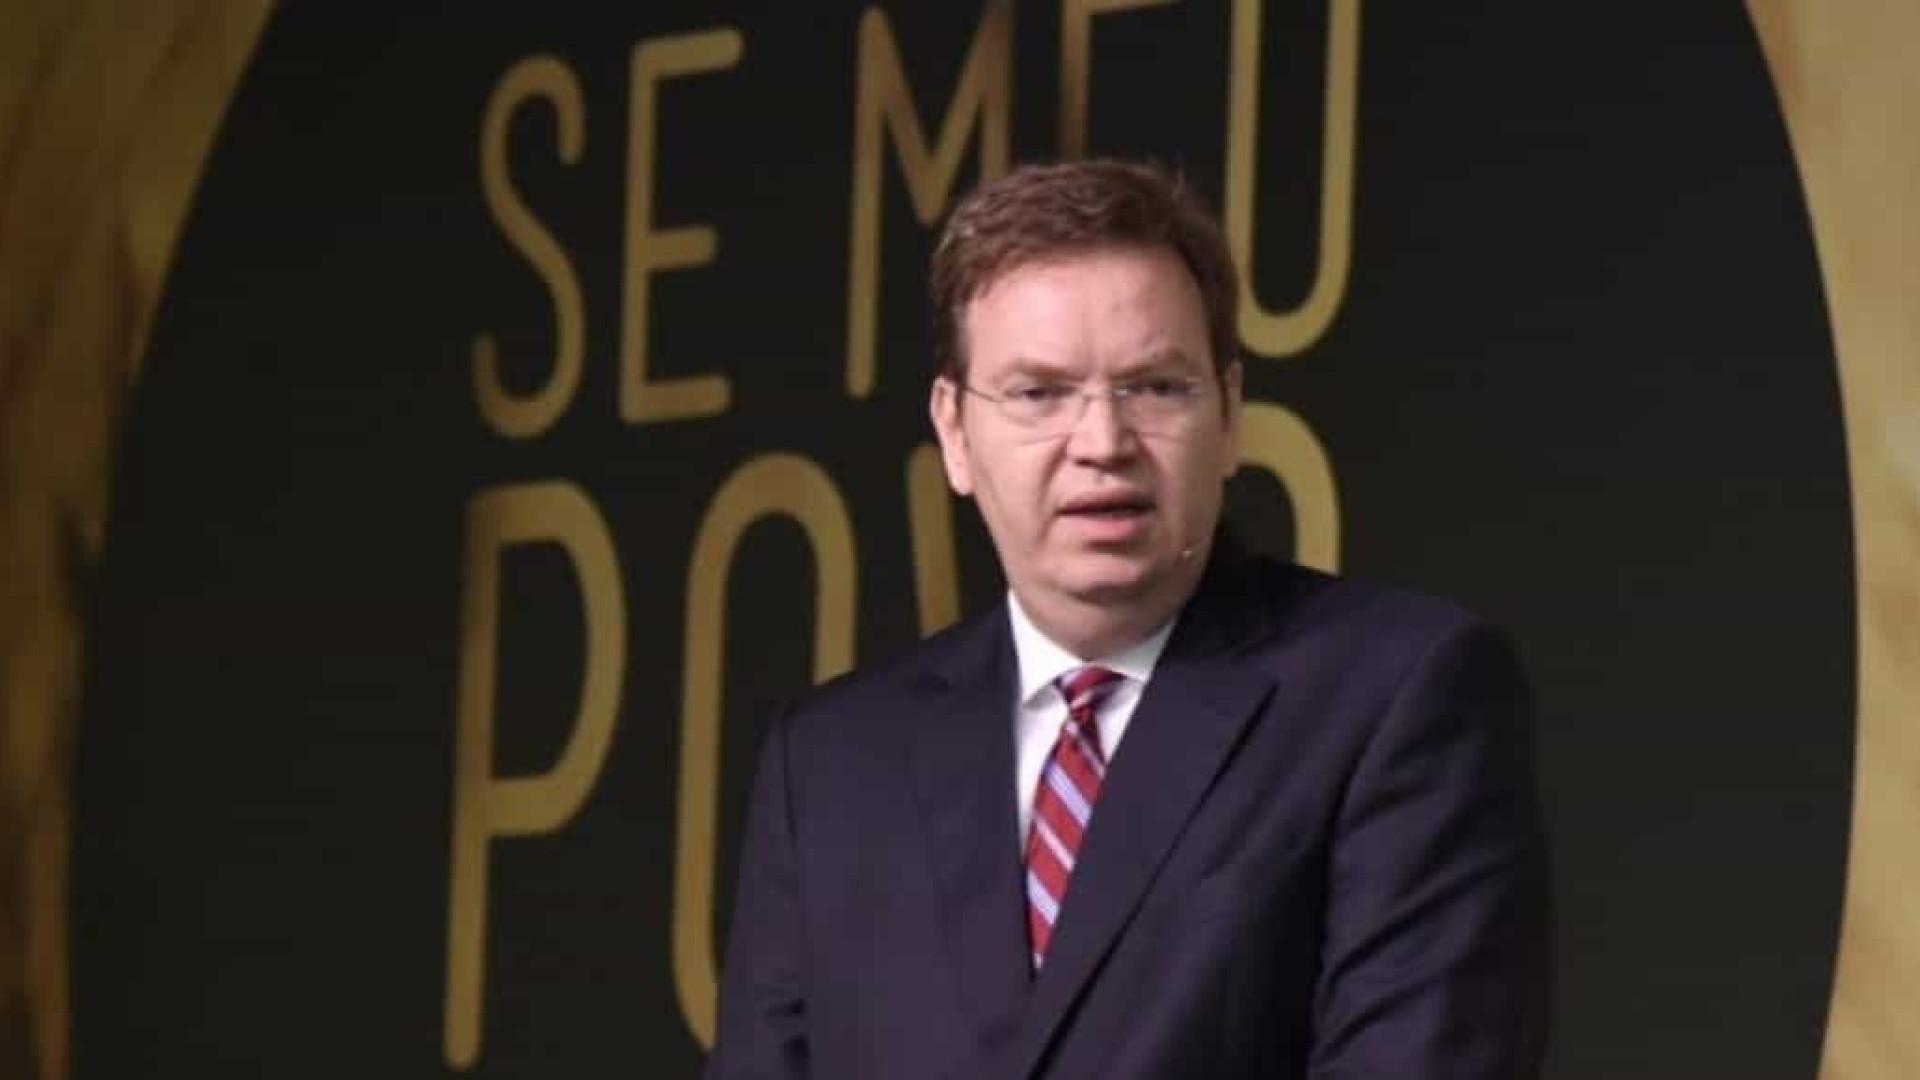 Investigado, Flávio tenta aproximar Bolsonaro de juiz evangélico por vaga no STF